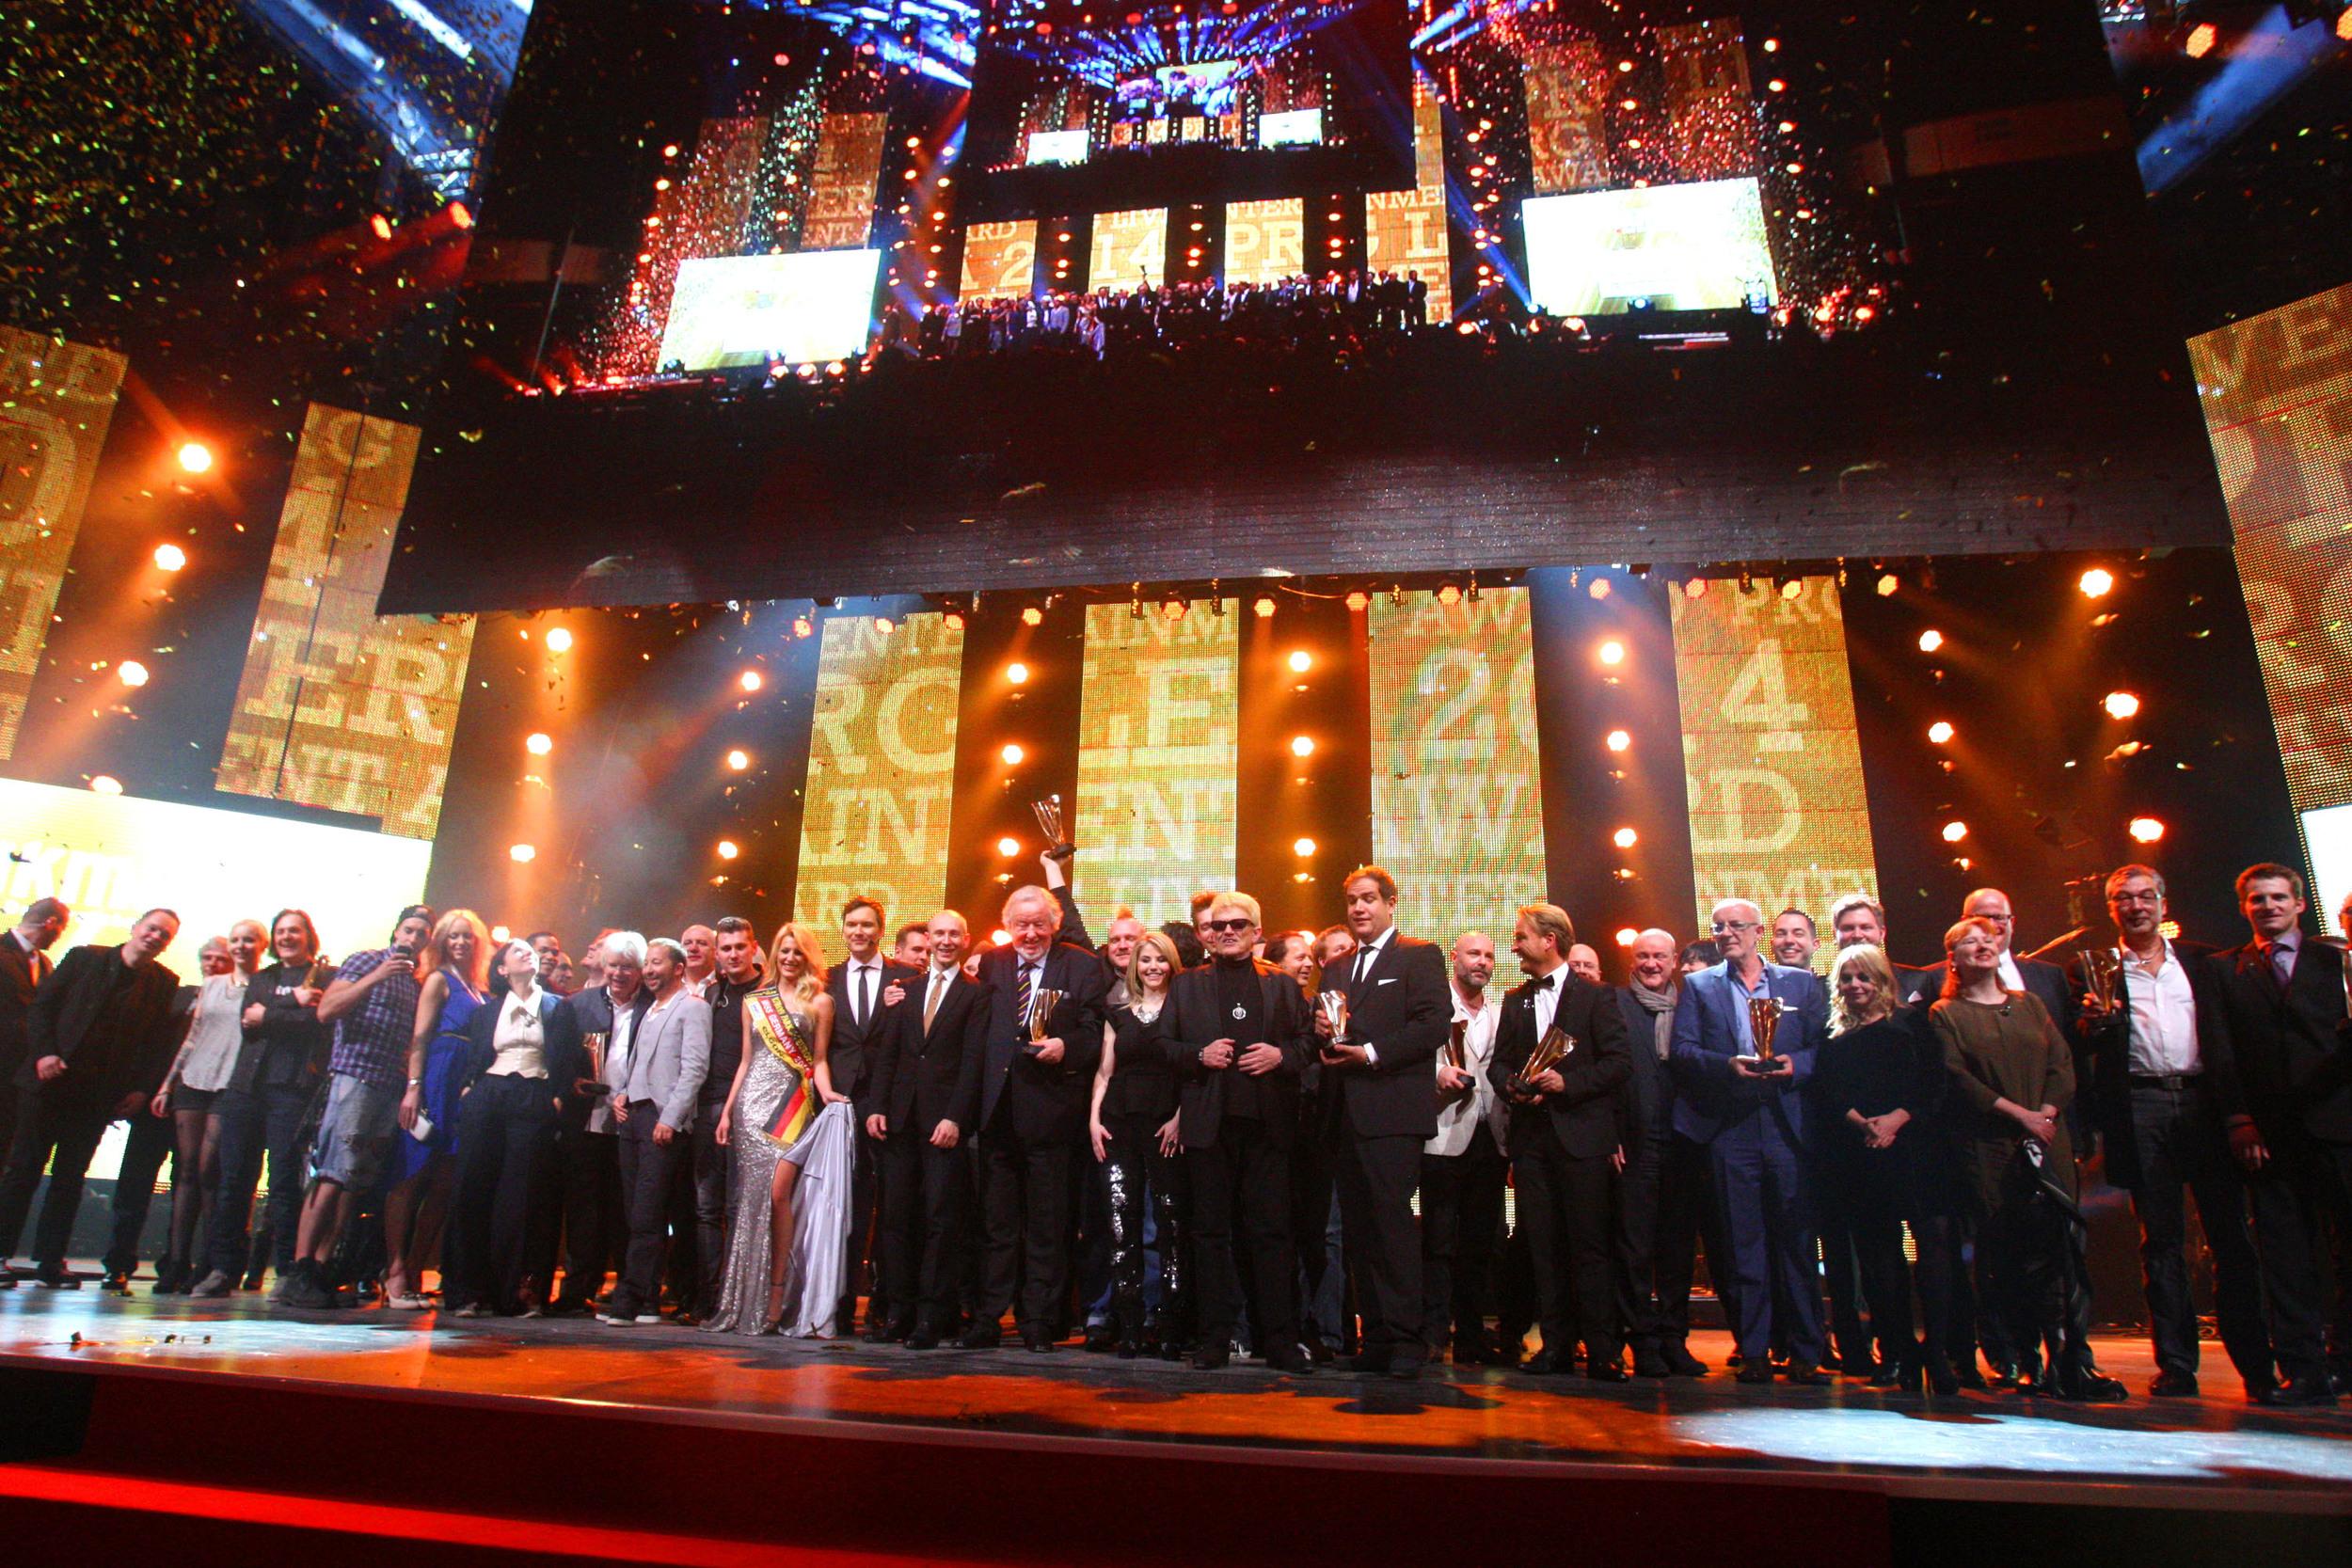 Live Entertainment Award 2014 - Finale - Frankfurt ( @ public address)